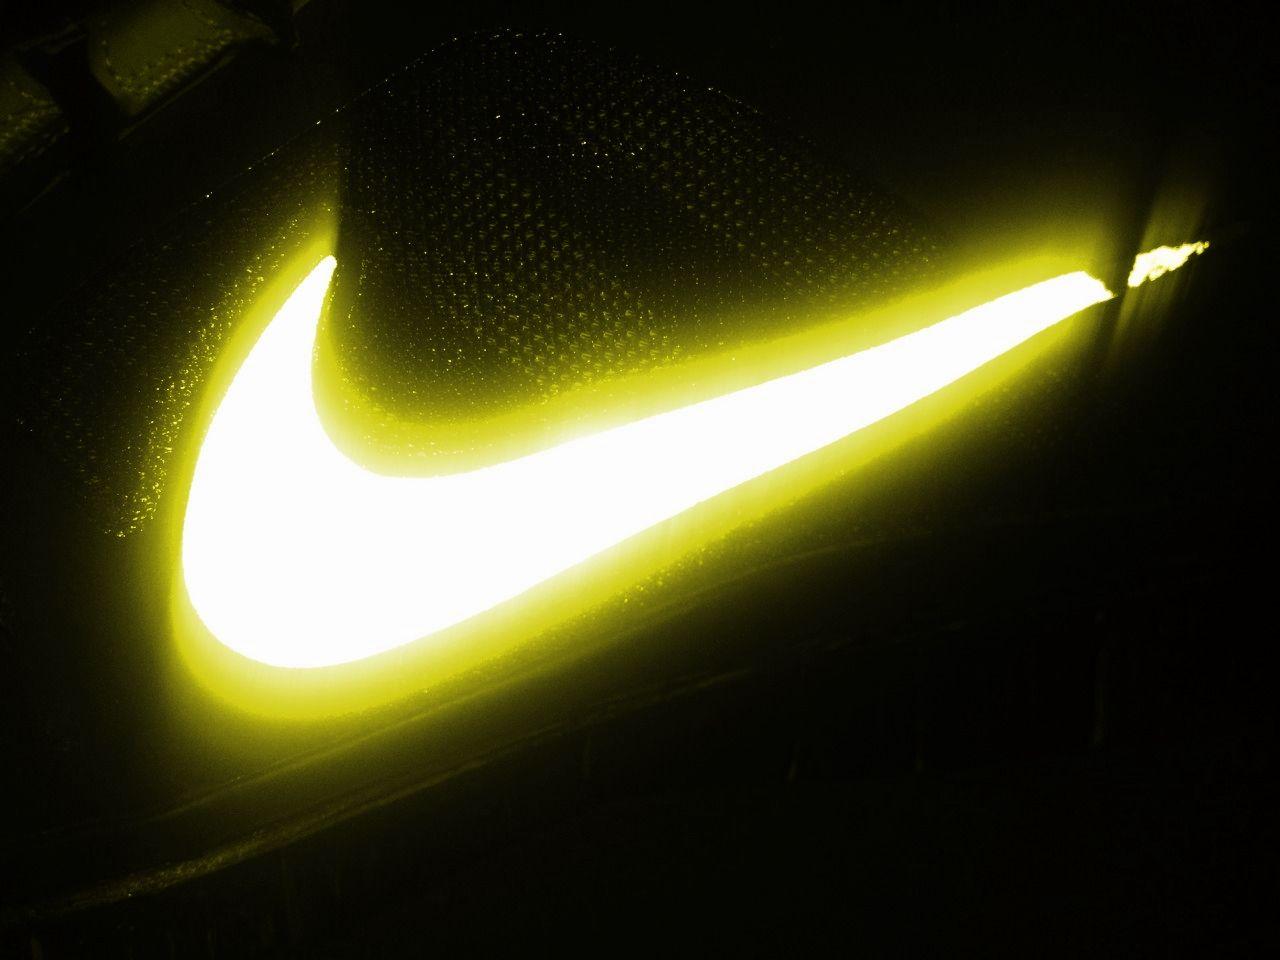 P V L E Divine Light Lights Glow